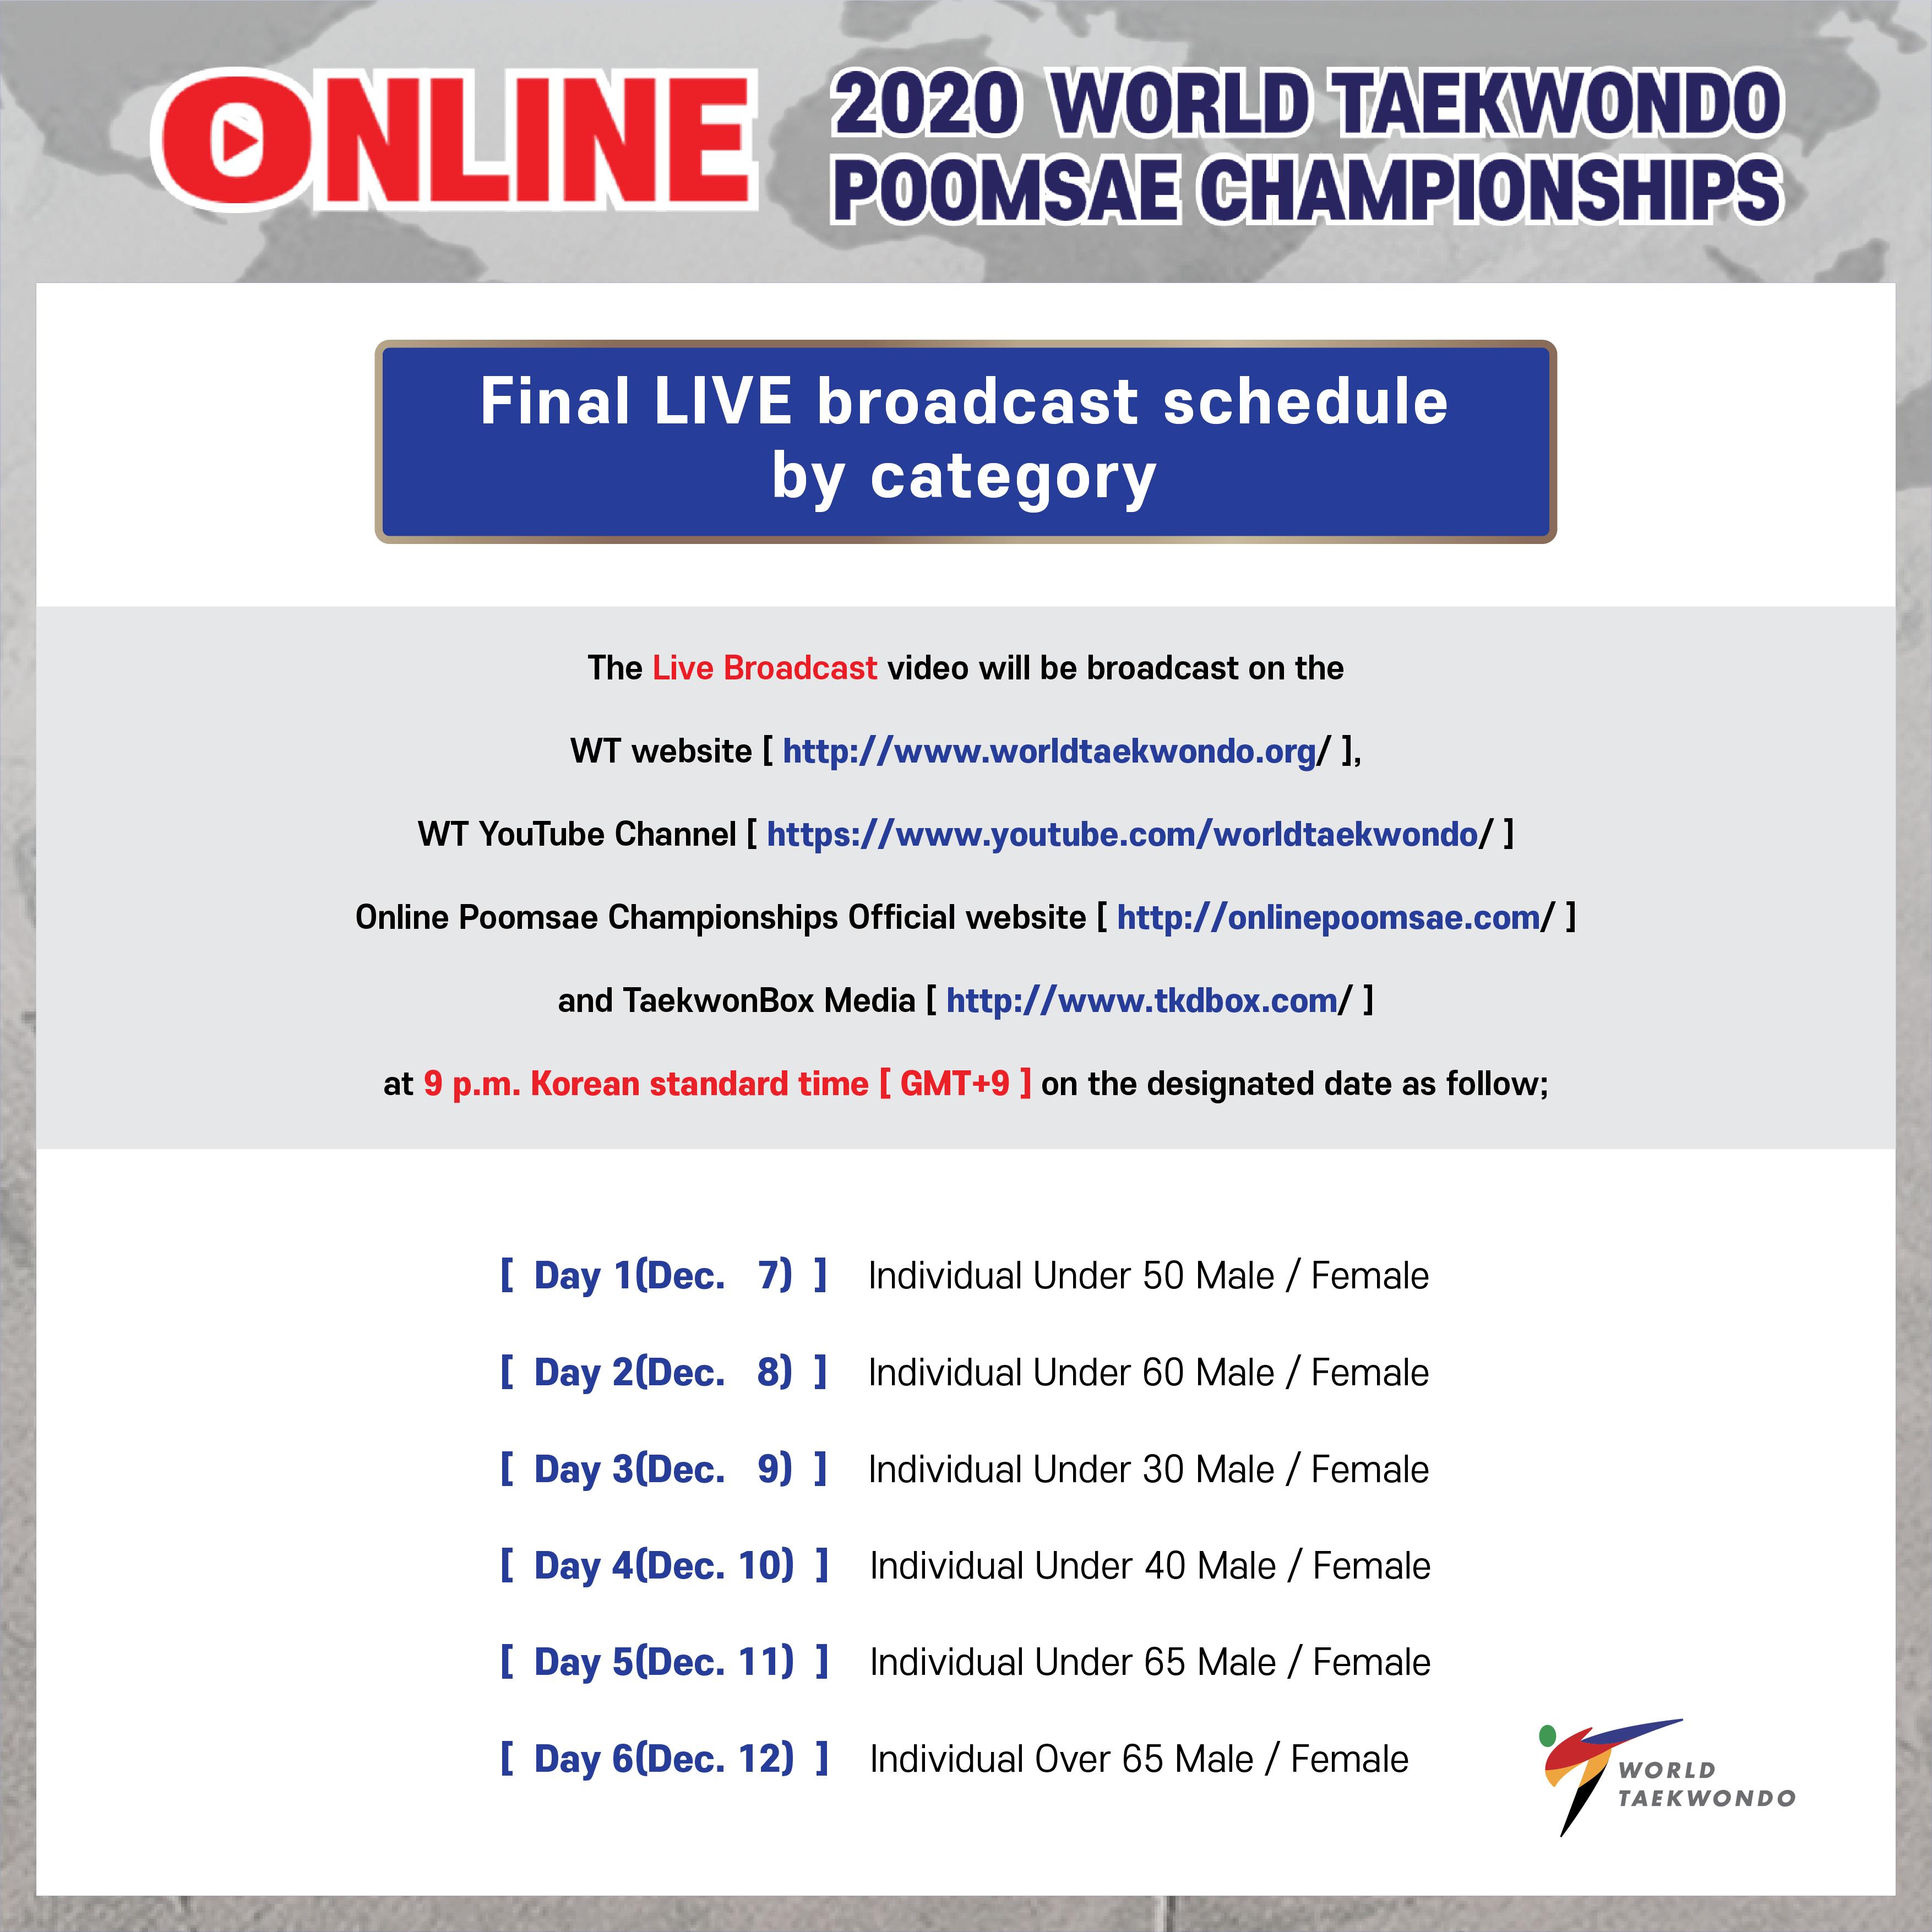 Maria Gilgen & Luzian Kopp in Final Online 2020 World Taekwondo Poomsae Championships